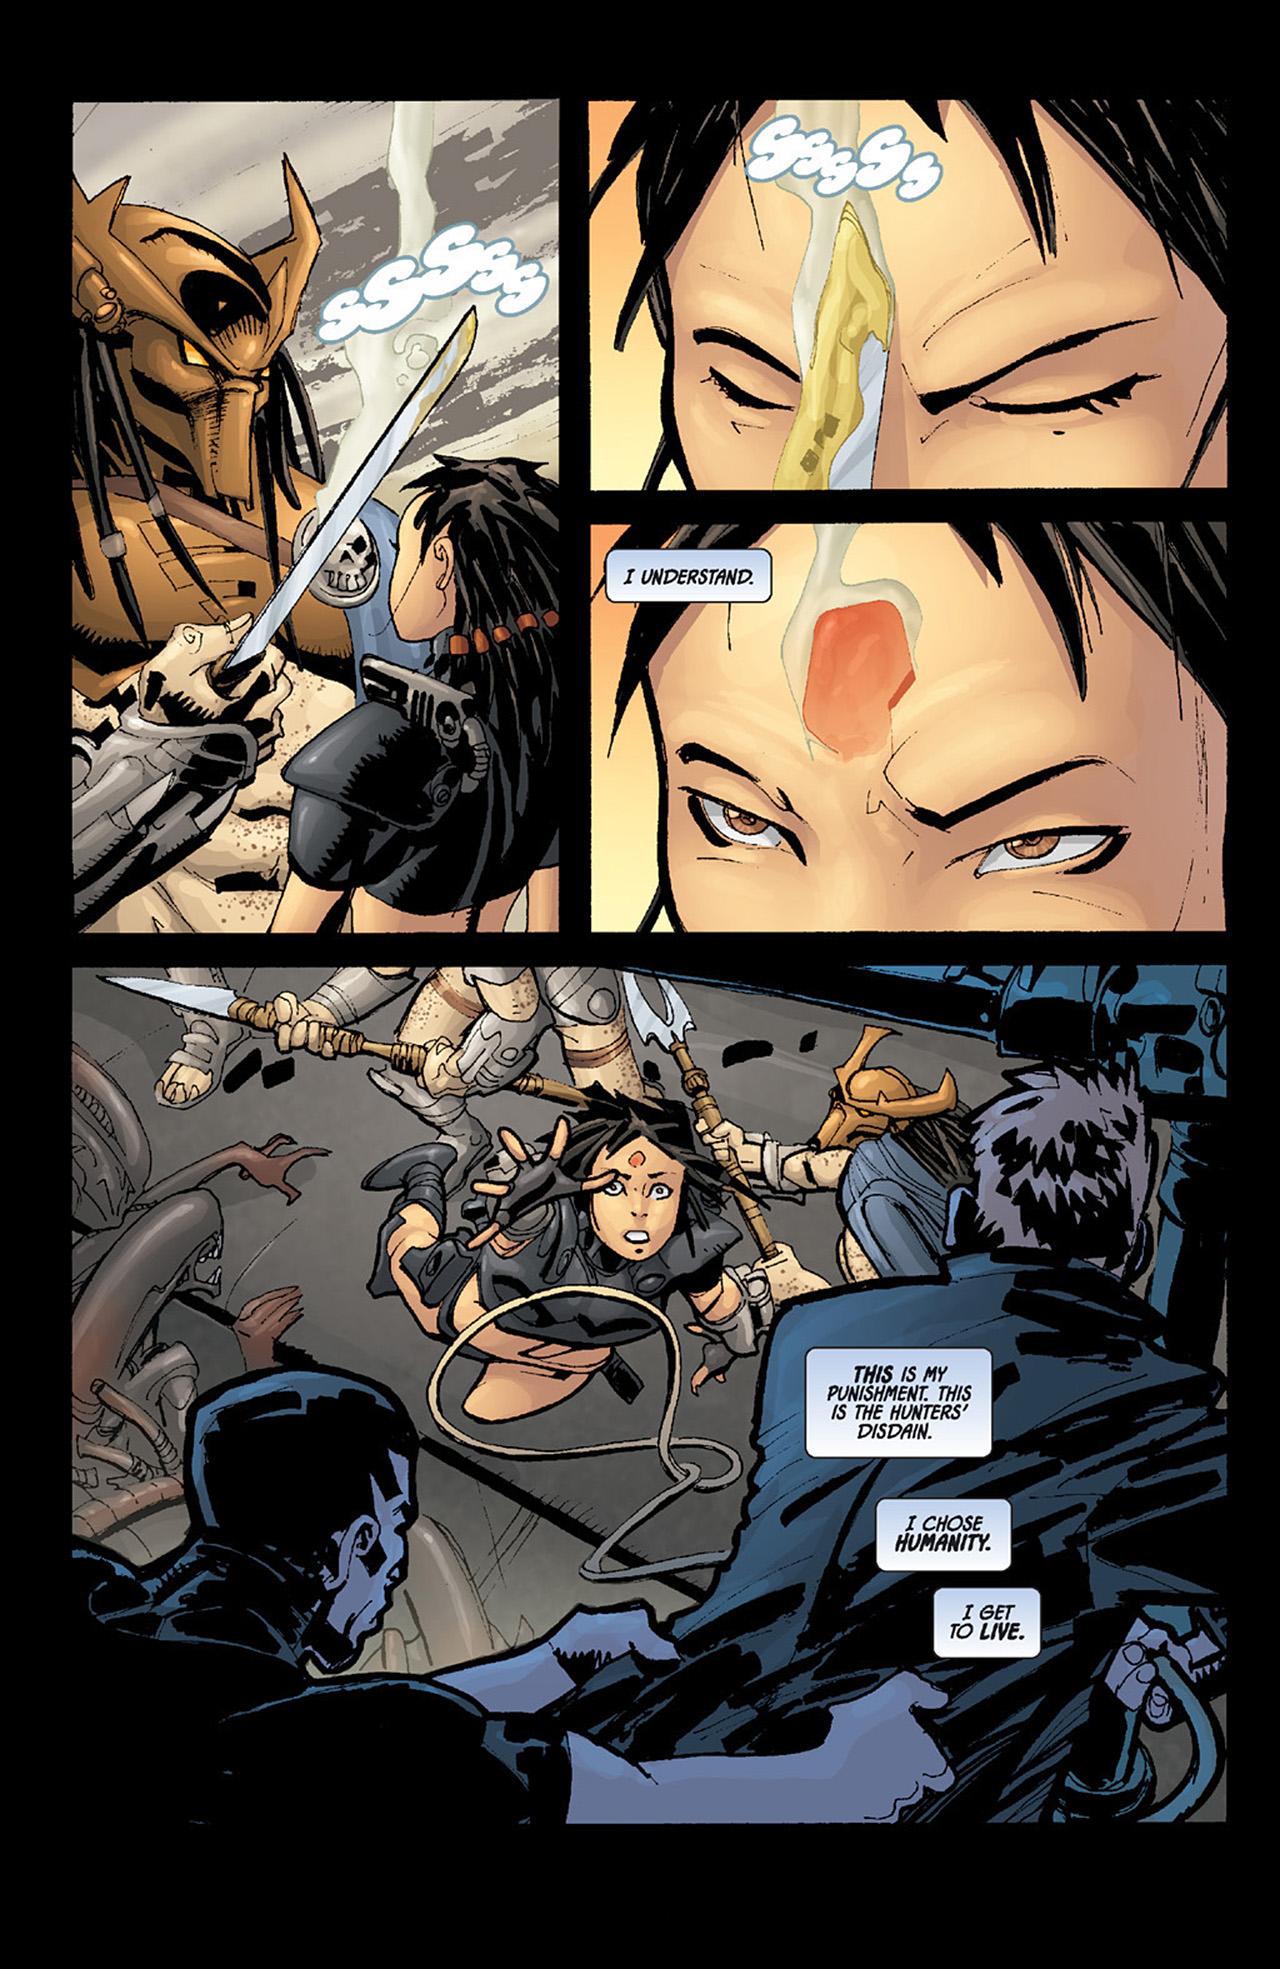 Read online Aliens vs. Predator: Three World War comic -  Issue #6 - 22